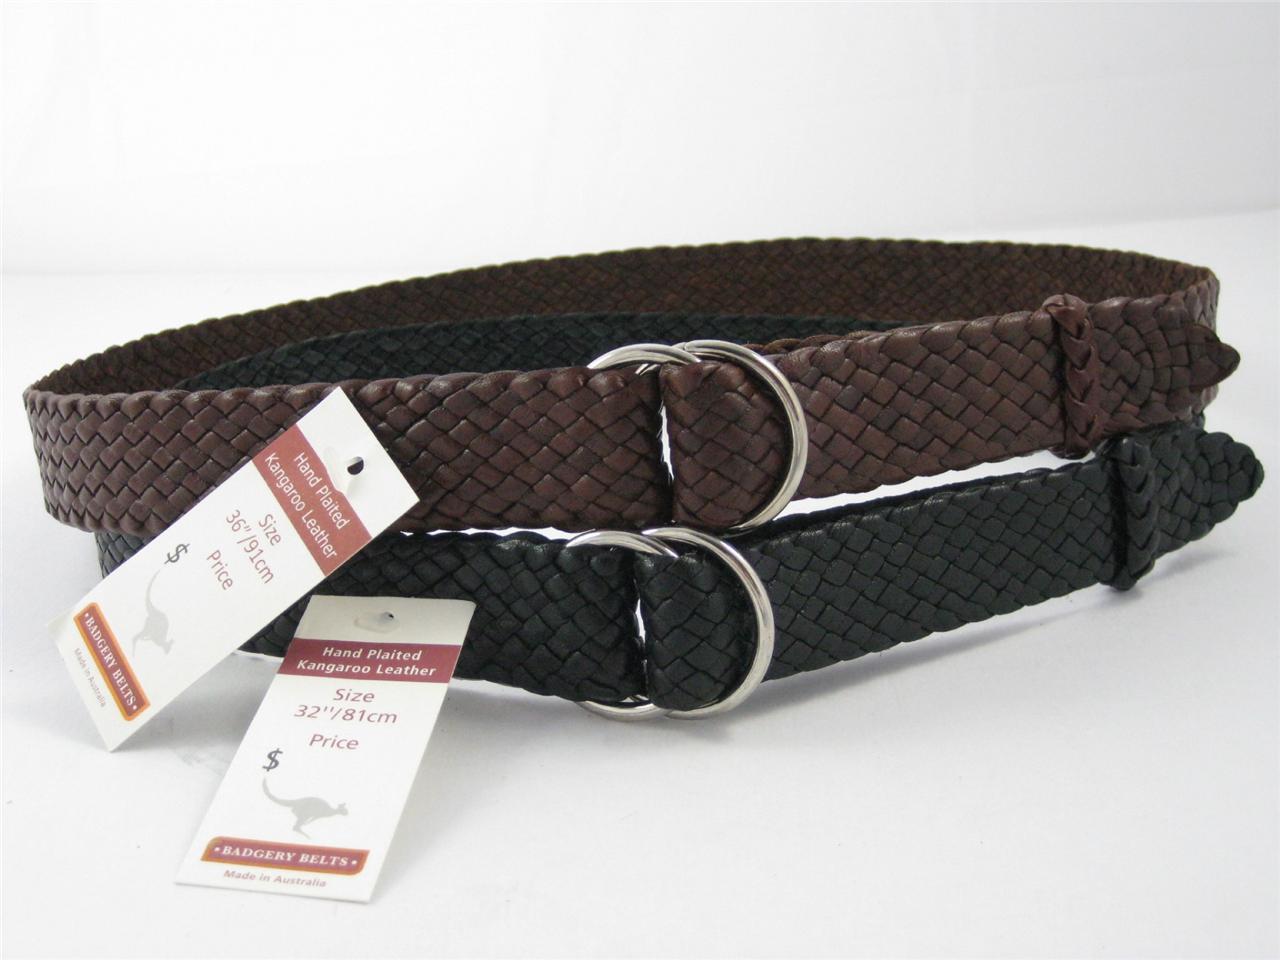 badgery new queenslander plaited kangaroo leather